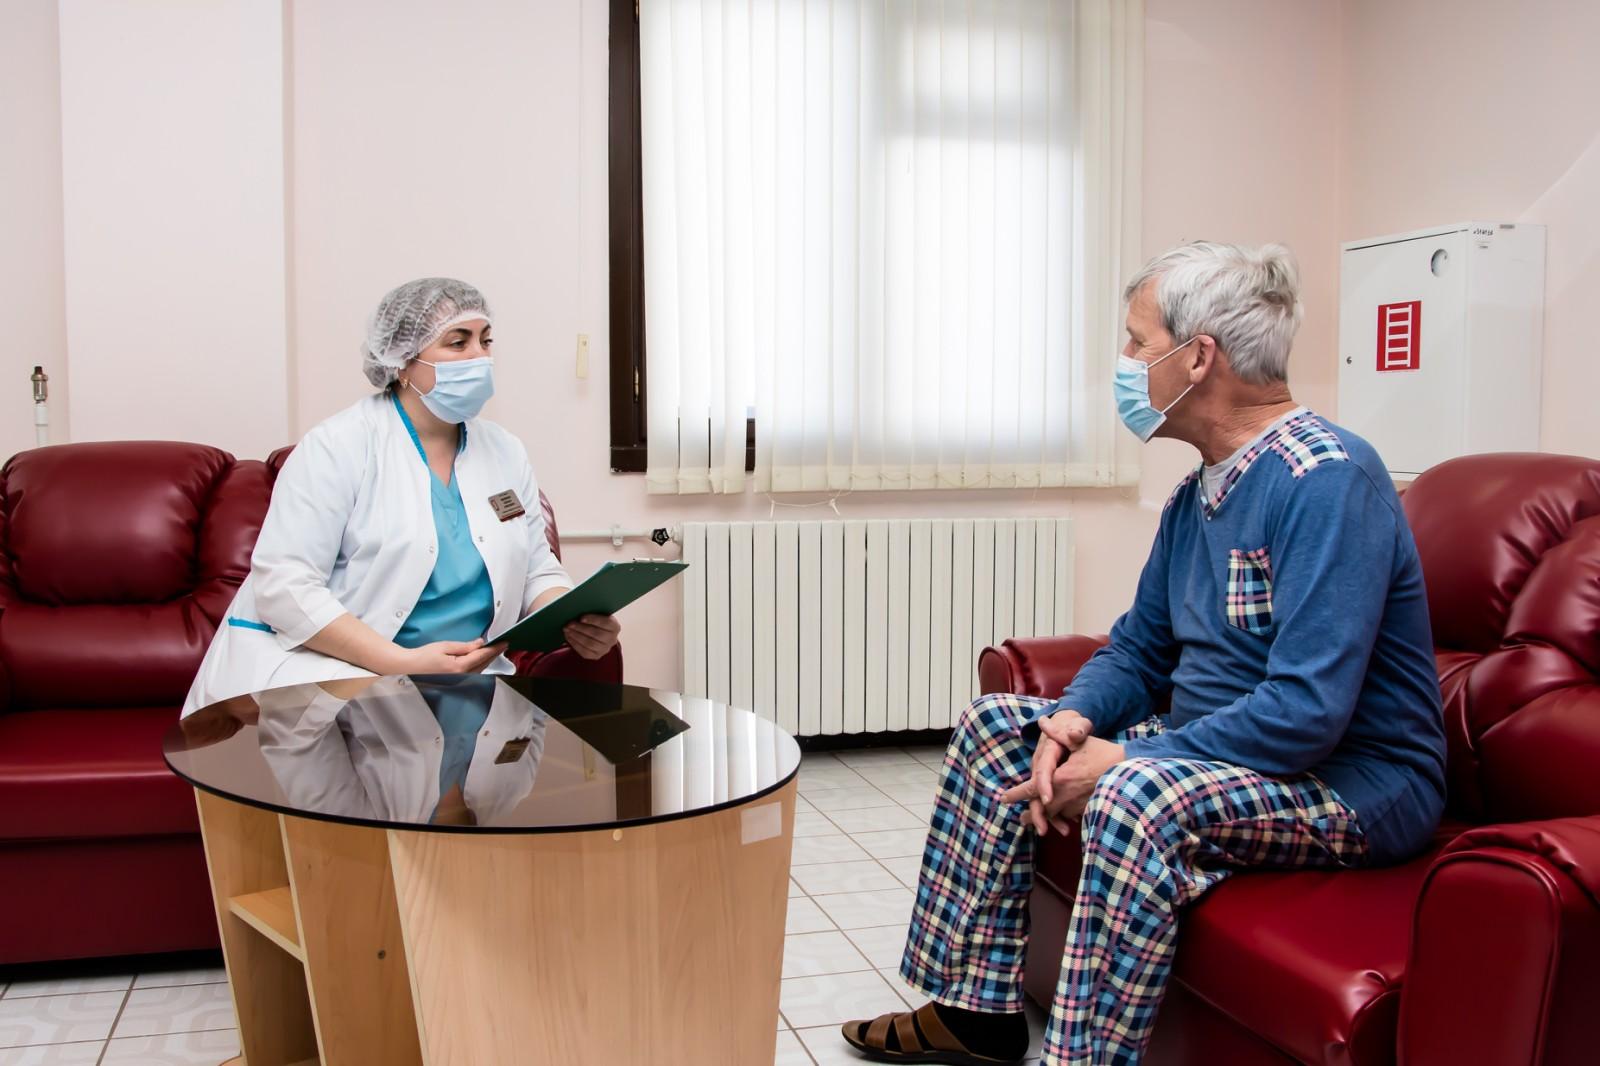 Тюменские хирурги помогли ямальцу с вышедшим наружу кардиостимулятором 1